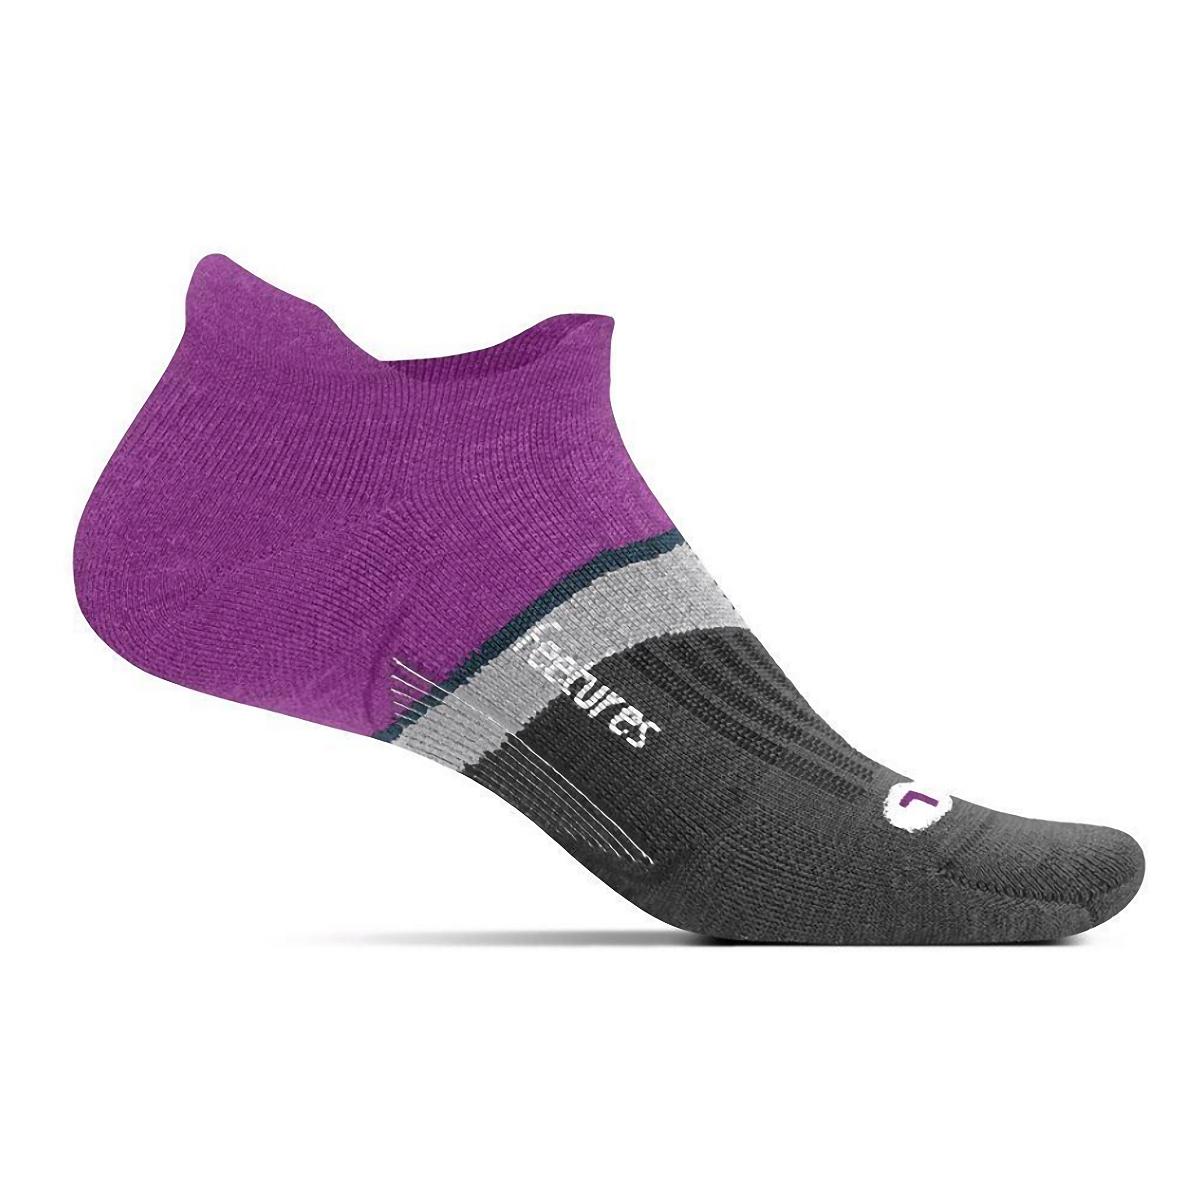 Feetures Merino 10 Ultra Light No Show Tab Socks - Color: Purple Addict - Size: S, Purple Addict, large, image 1